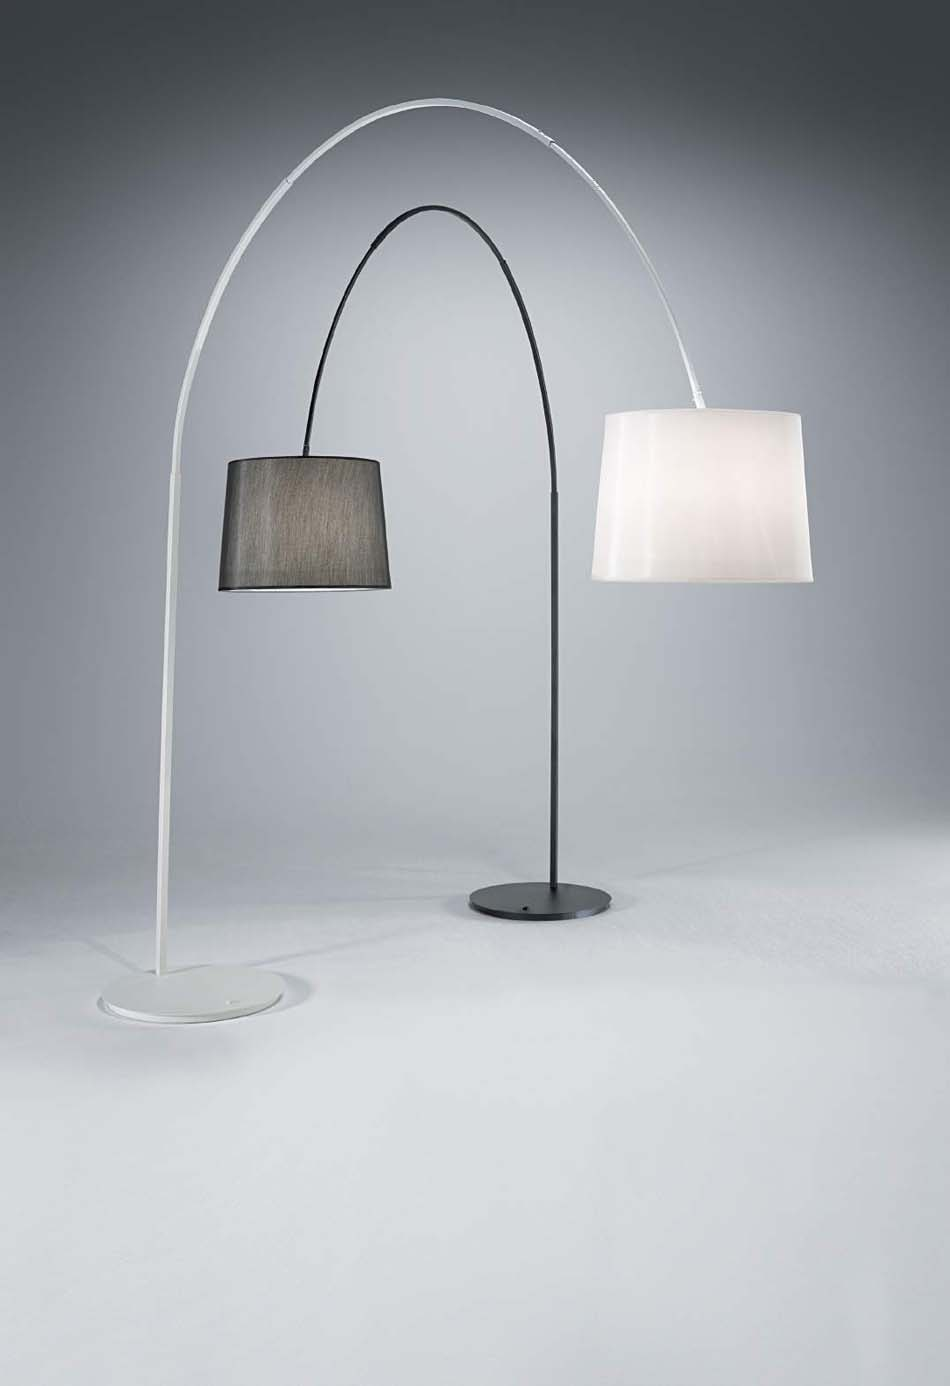 Lampade 20 Ideal Lux Dorsale – Toscana Arredamenti